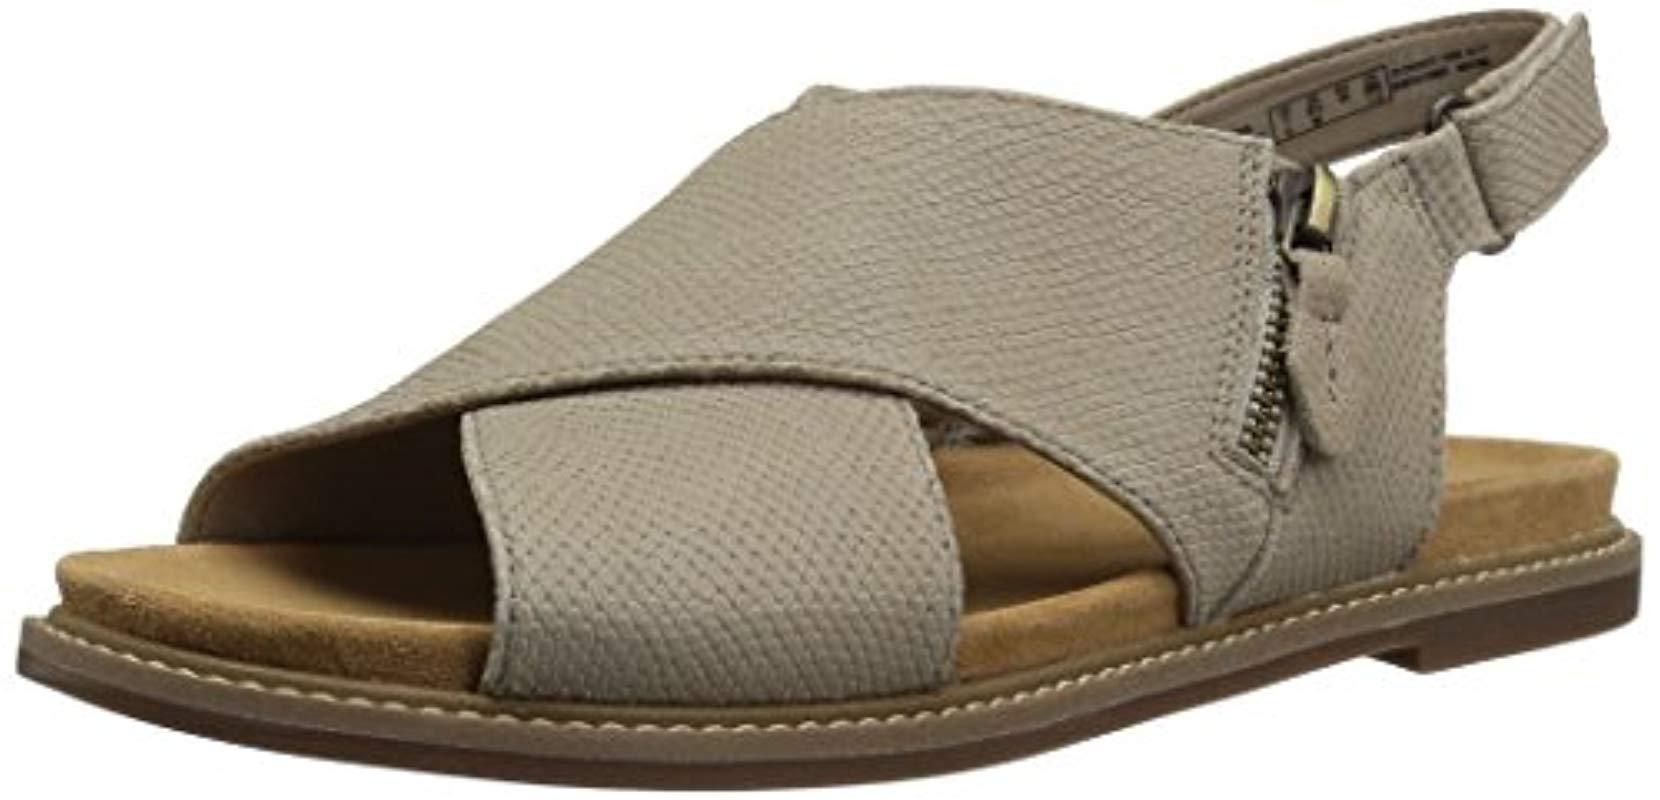 afc9647c1a3 Clarks - Multicolor Corsio Calm Flat Sandal - Lyst. View fullscreen